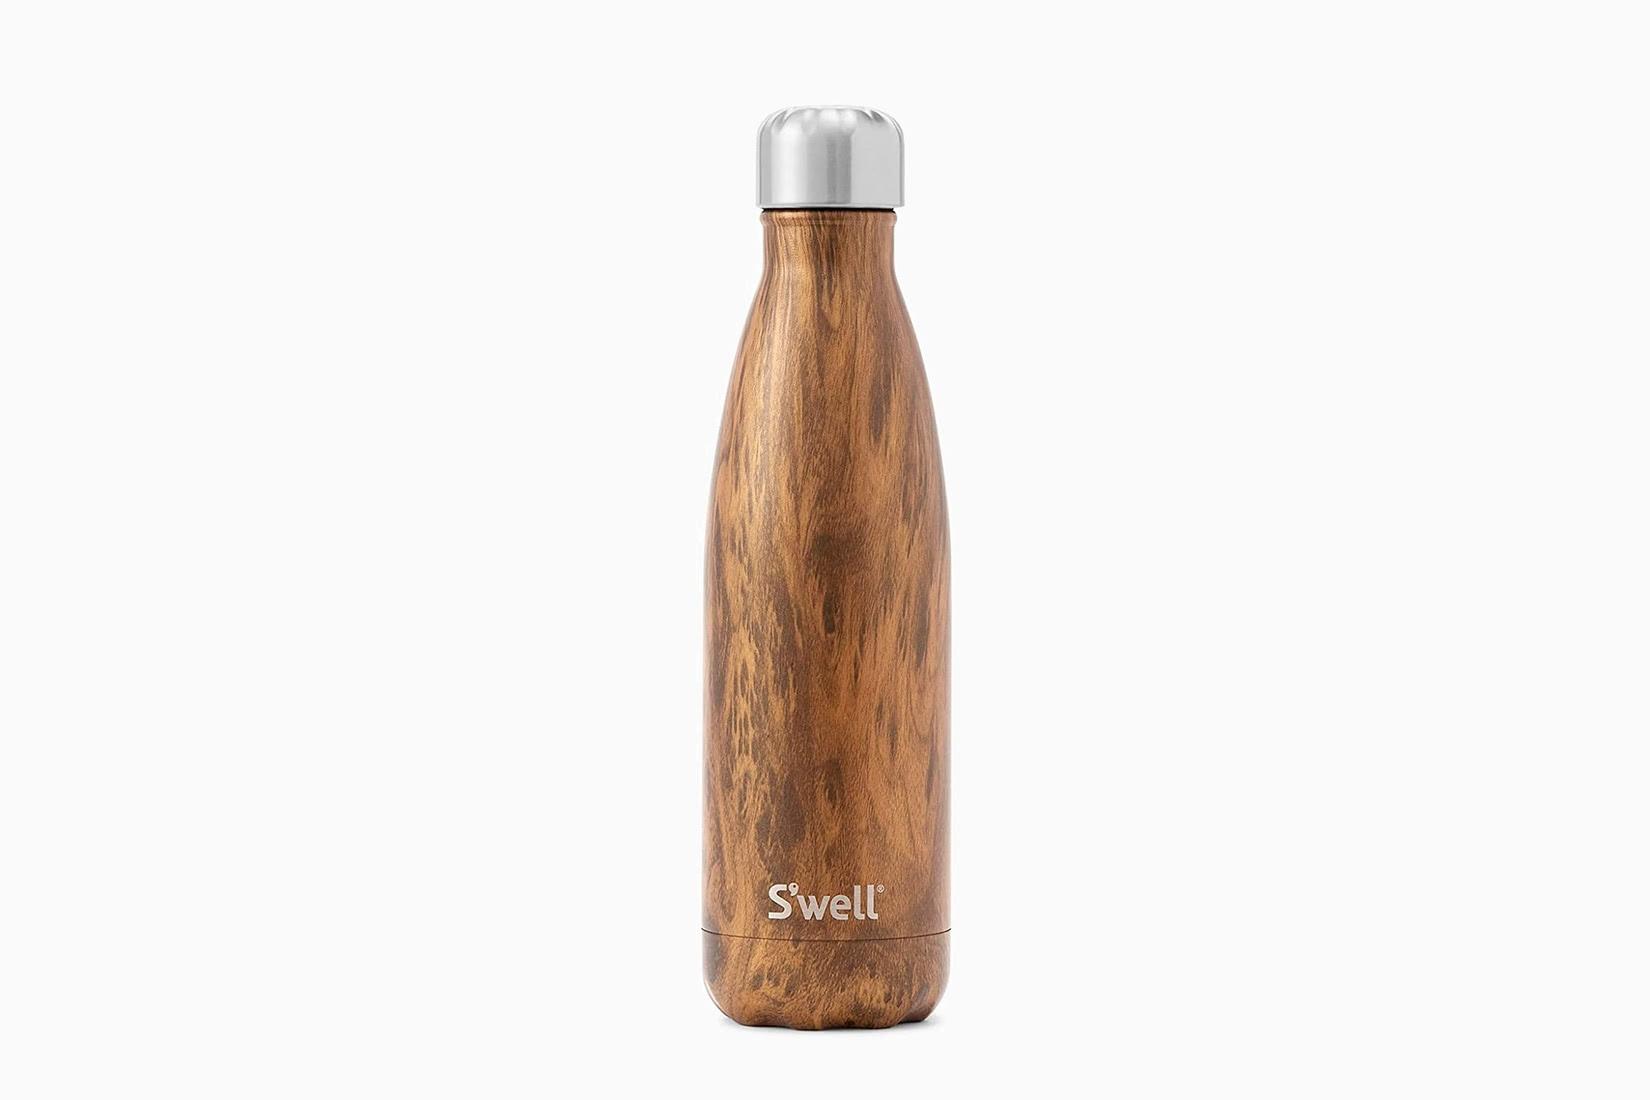 best water bottles office s'well original - Luxe Digital